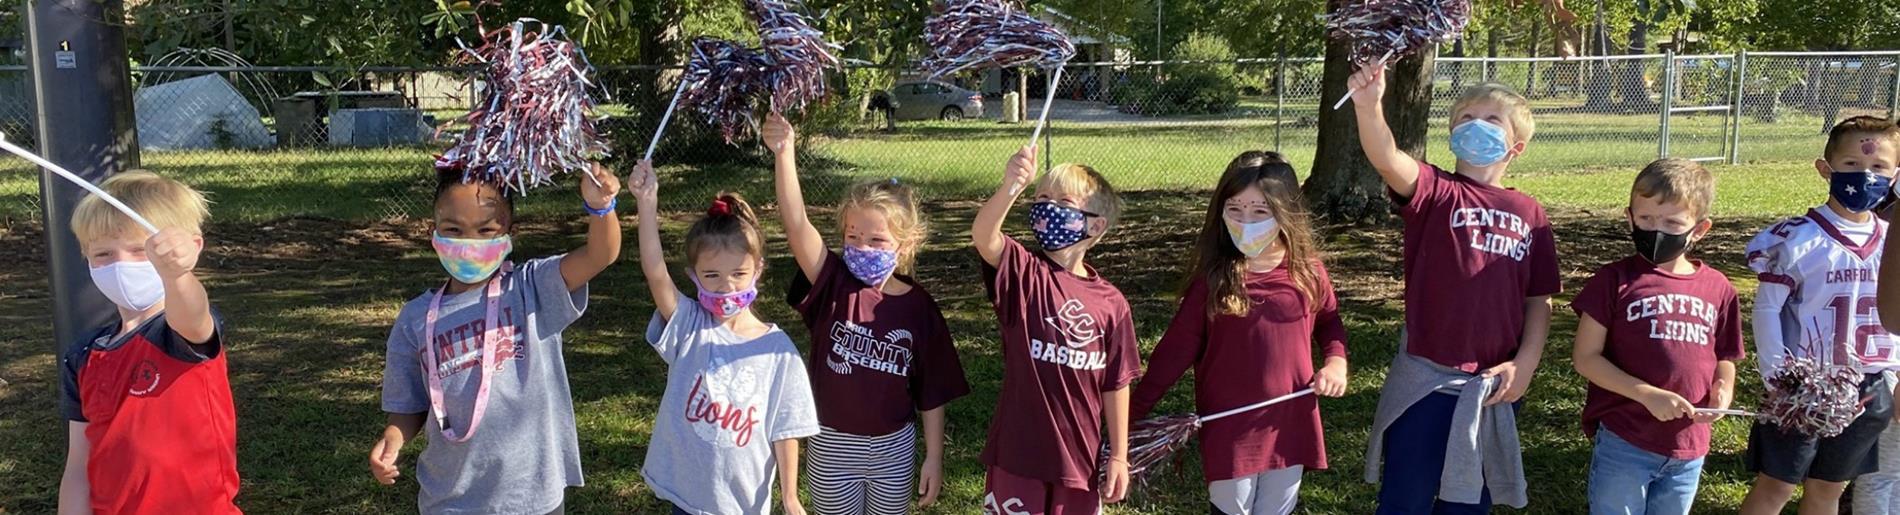 First grade students waving pom poms